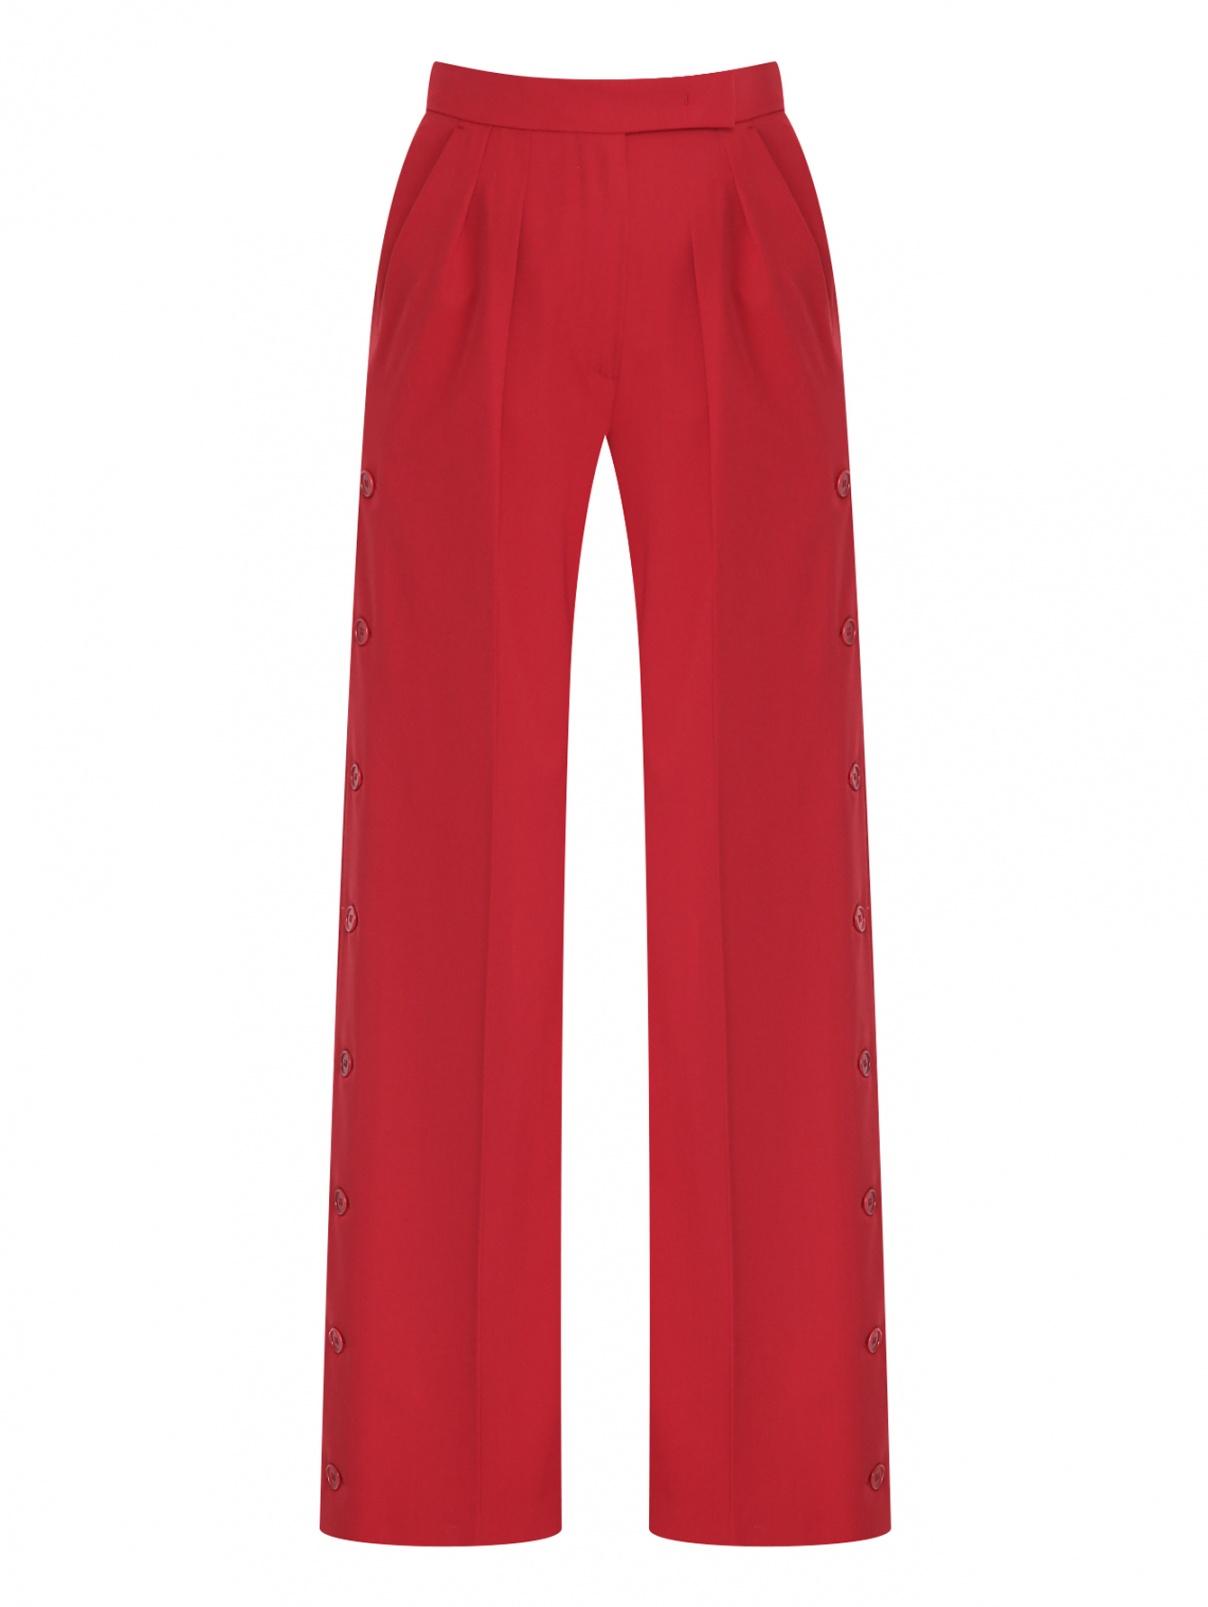 Широкие брюки из шерсти Max Mara  –  Общий вид